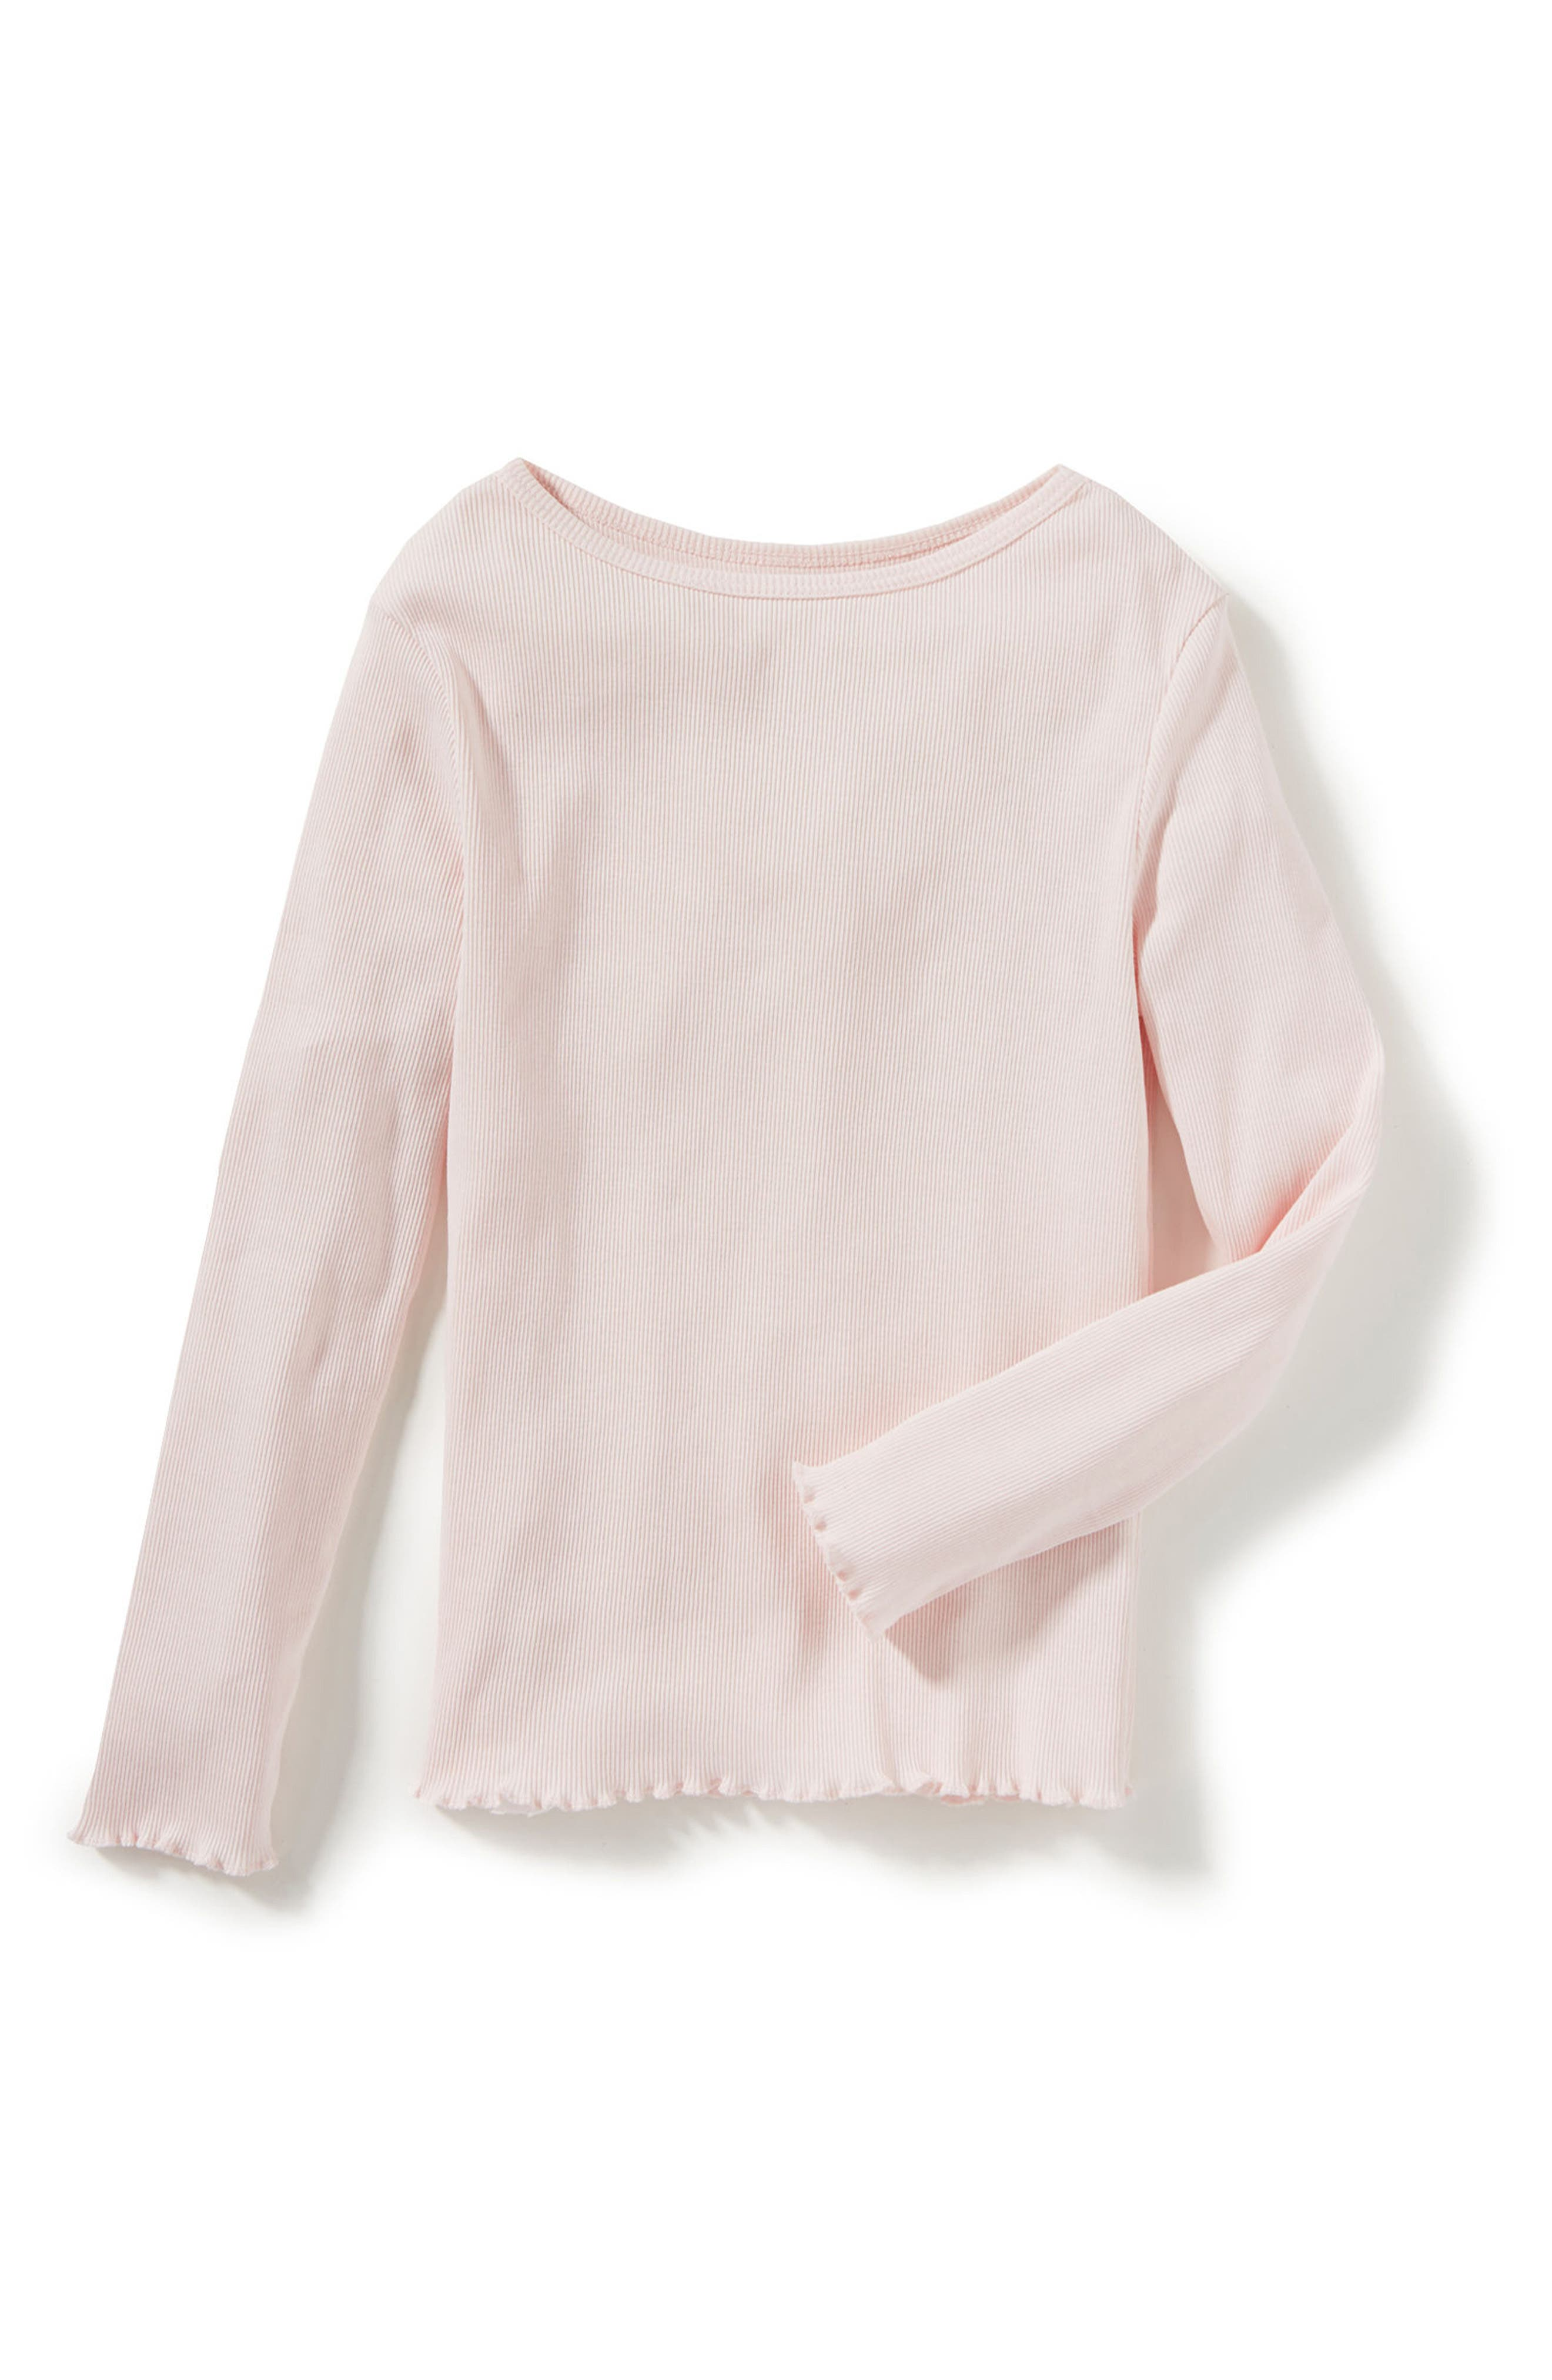 Marie Long Sleeve Tee,                             Main thumbnail 1, color,                             Light Pink